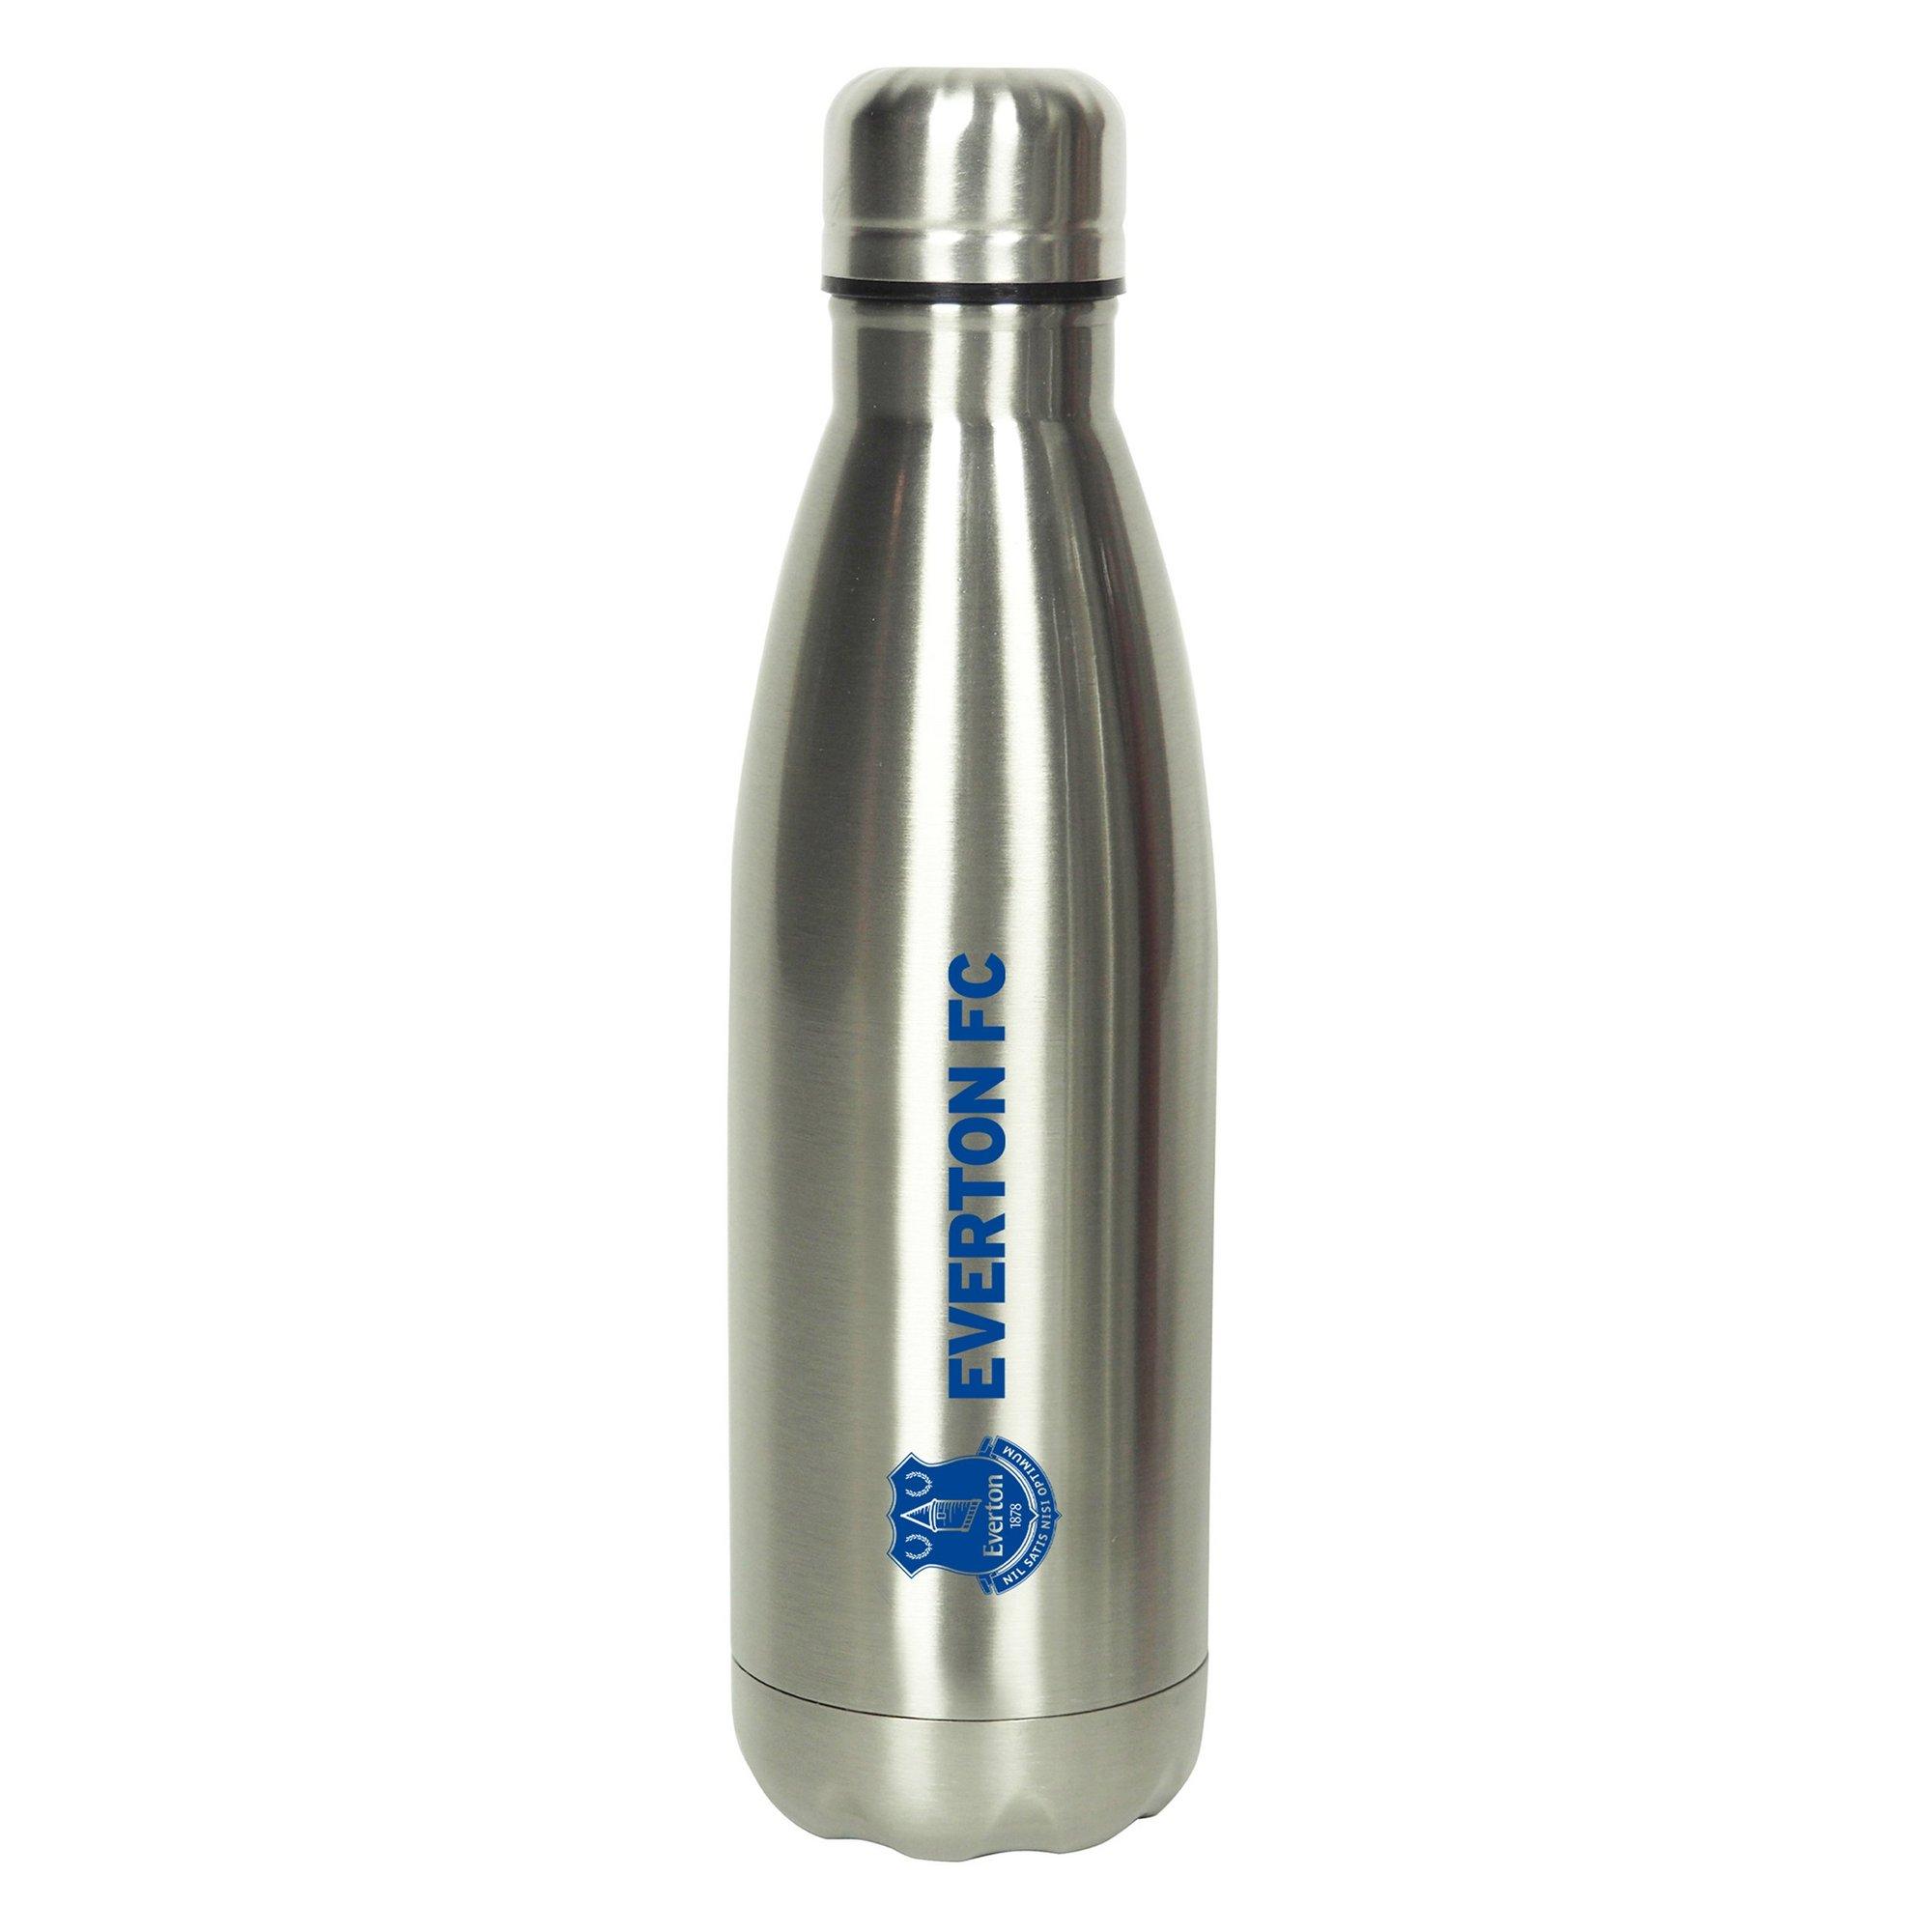 Image of Everton FC Stainless Steel Drinks Bottle